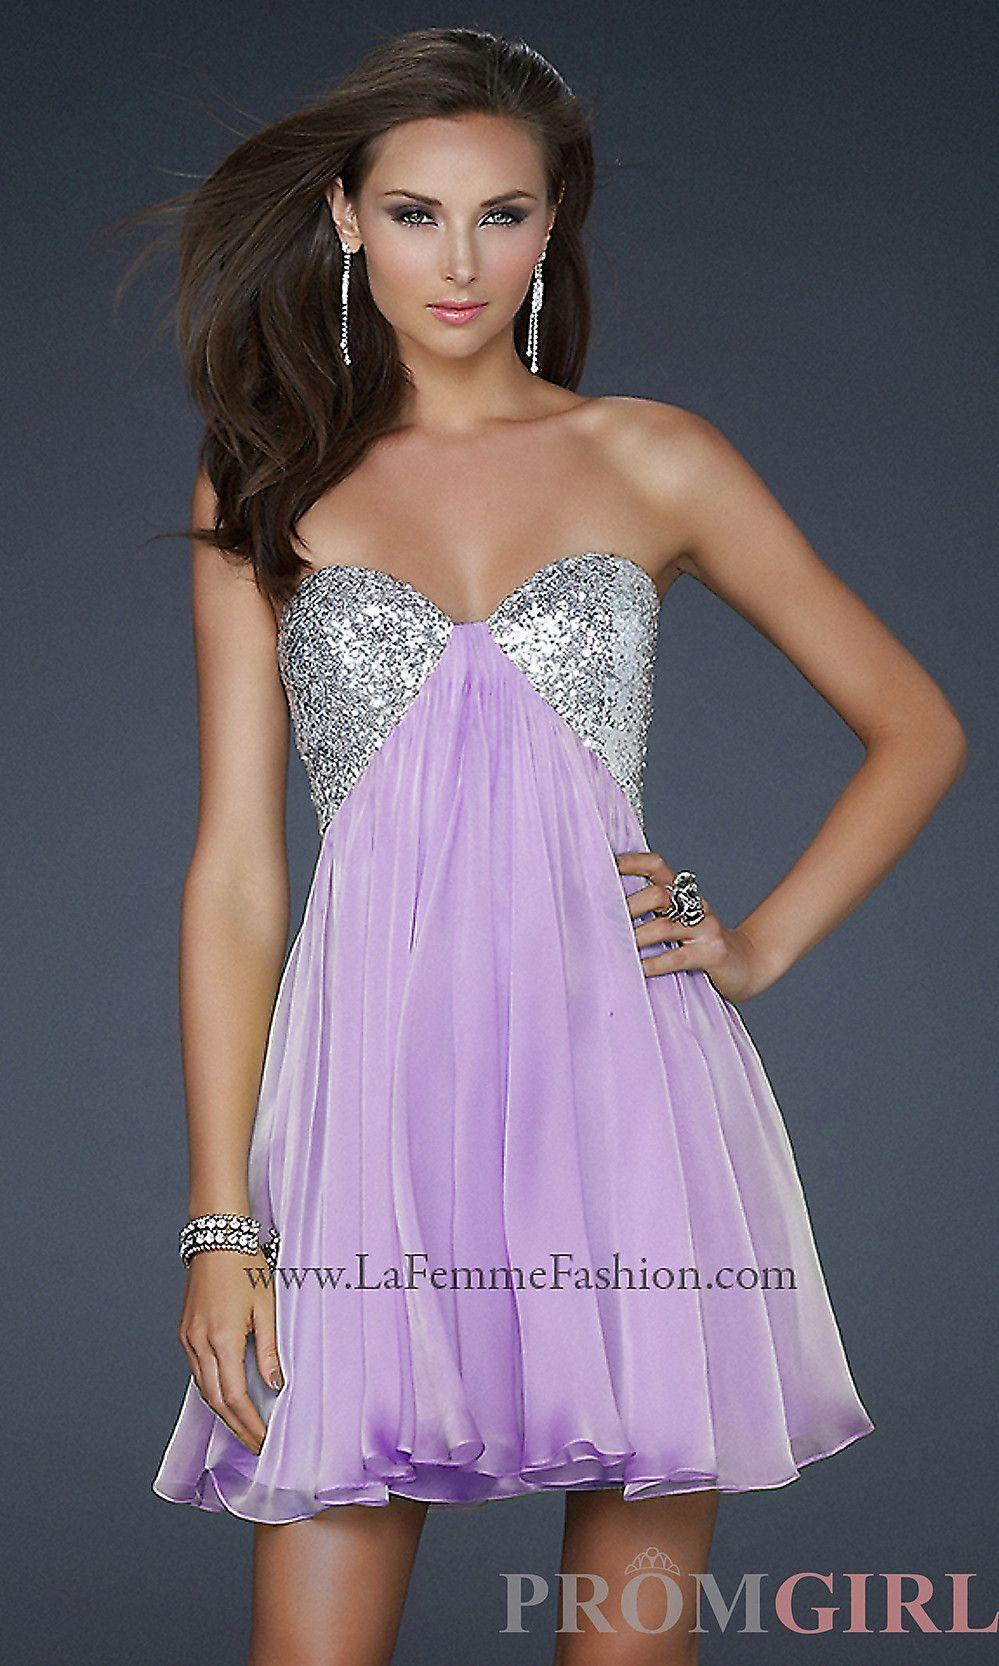 La Femme Short Strapless Prom Dress LF-17649 - promgirl.com ...